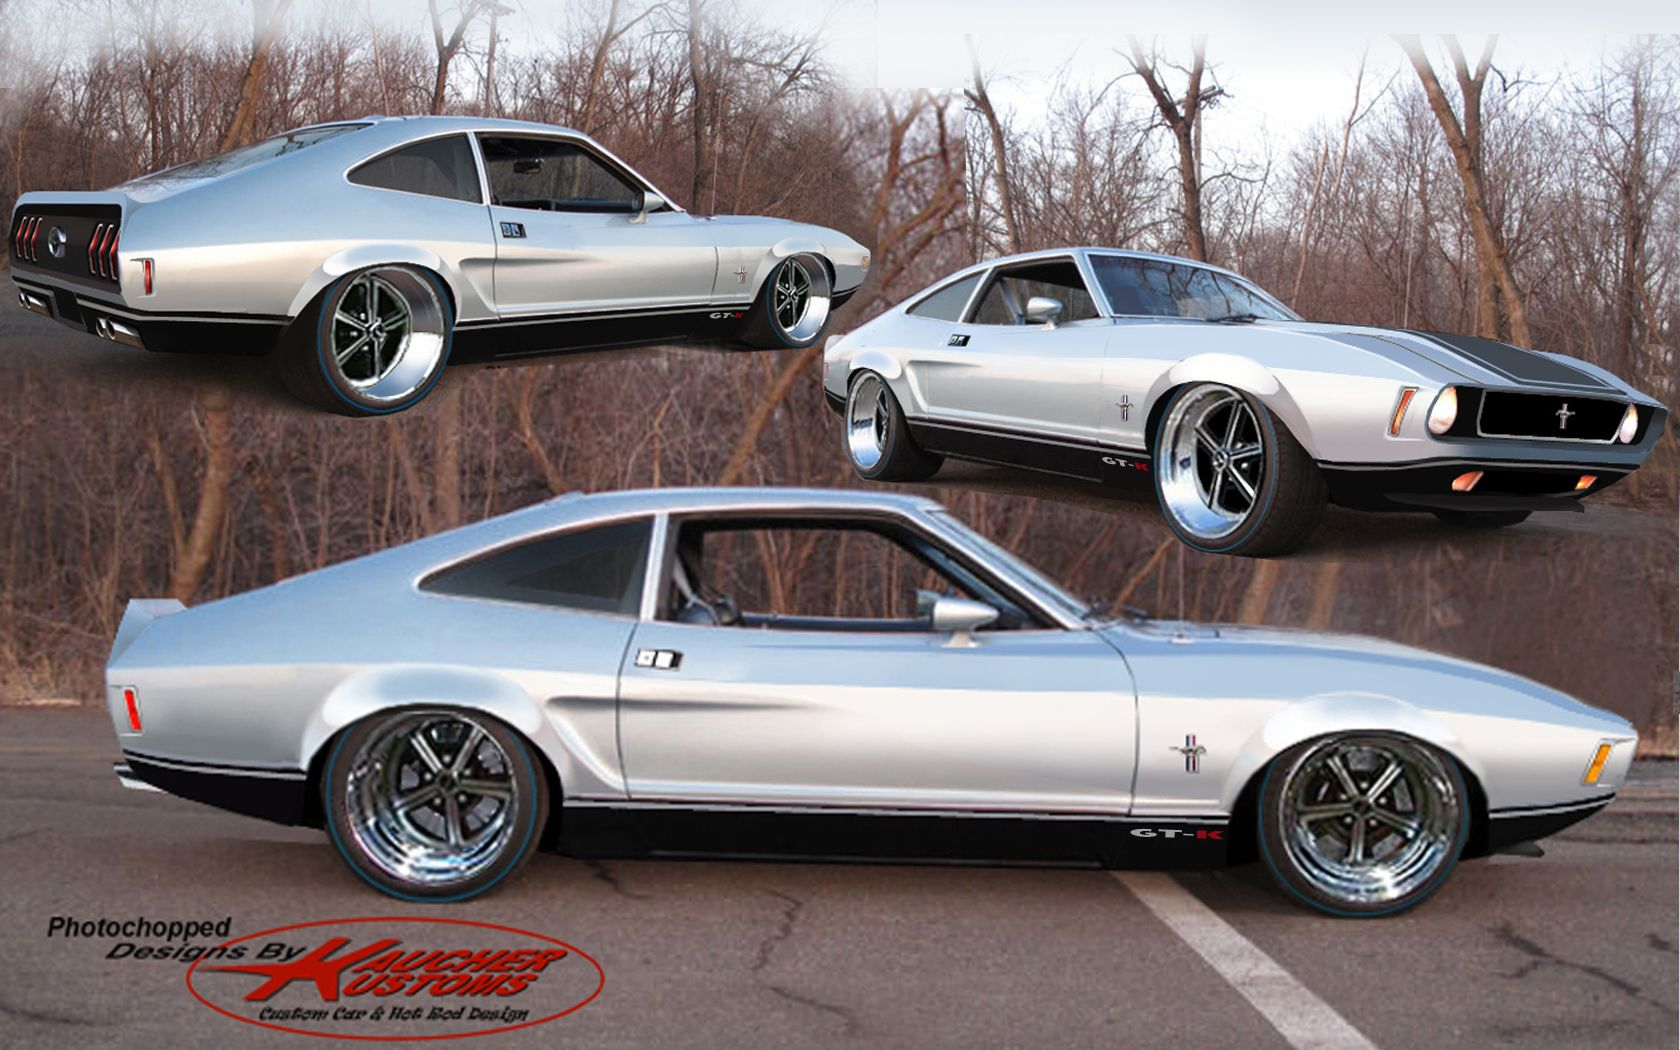 Mustang Ii Based On Maverick Platform As Was Originally Intended Mustang Ii Mustang Custom Cars